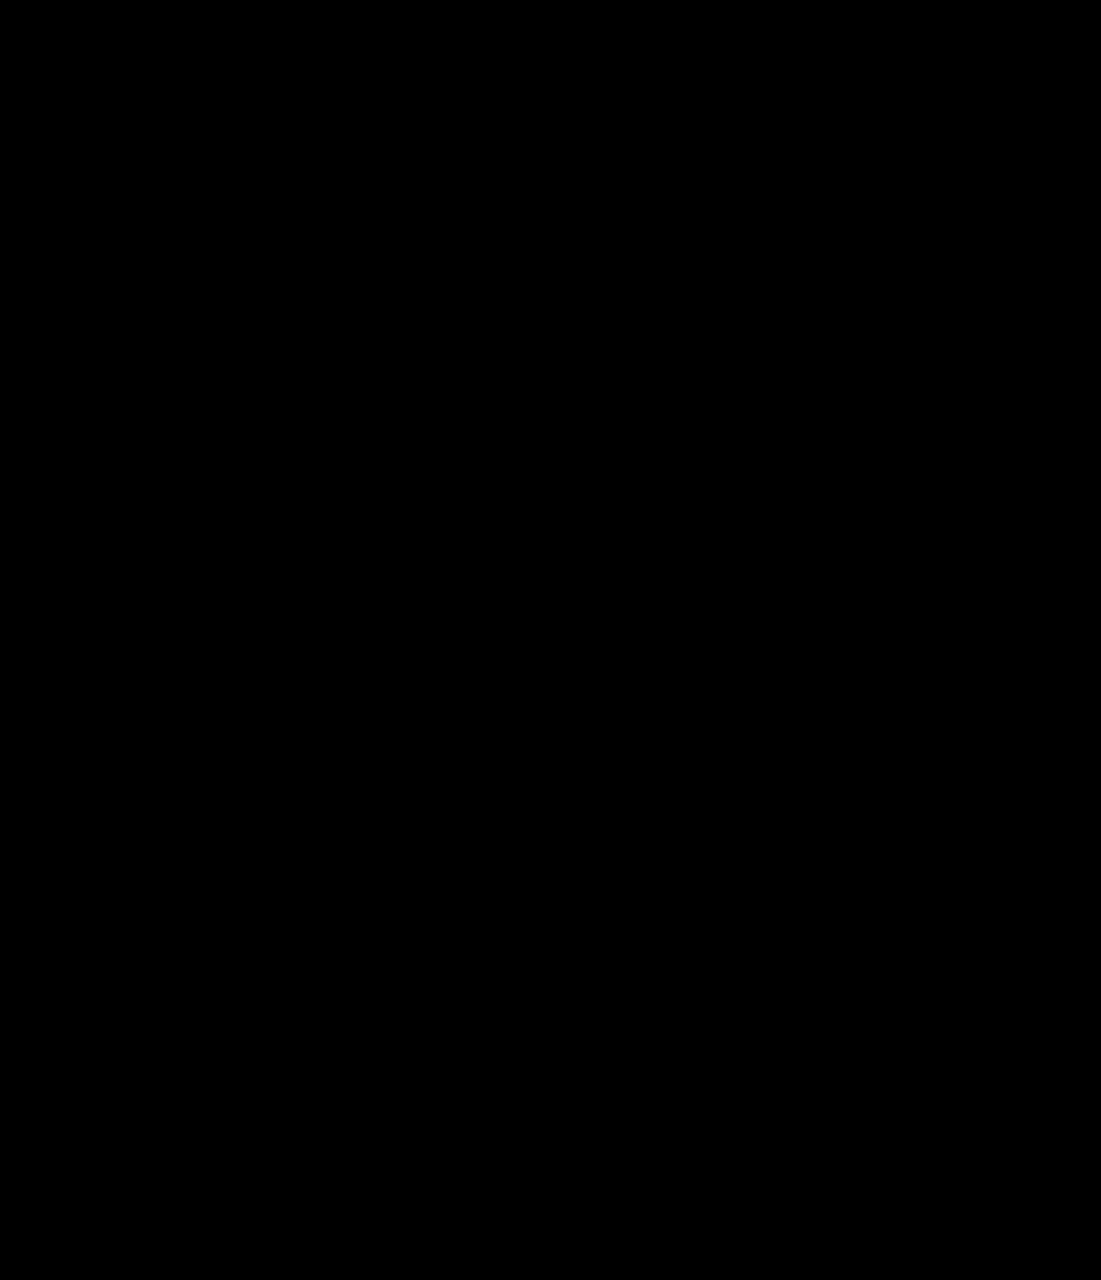 Картинка черно белый петух